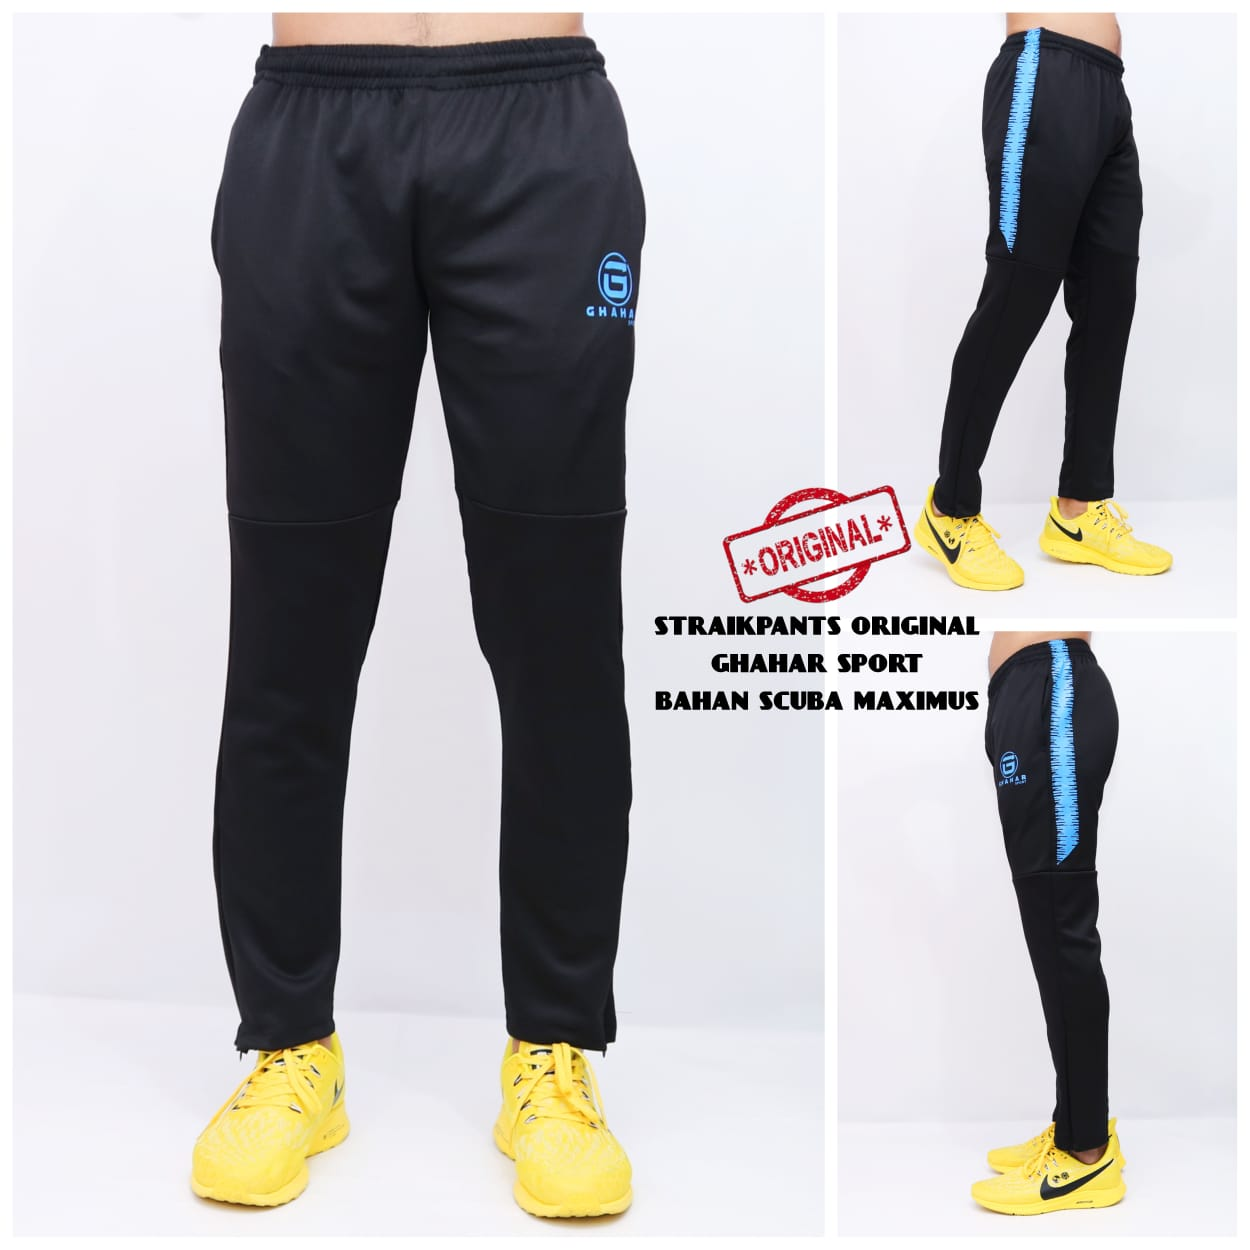 celana training straikpants pria / celana olahraga pria sepeda-jogging-jalan santai /celana ghahar sport